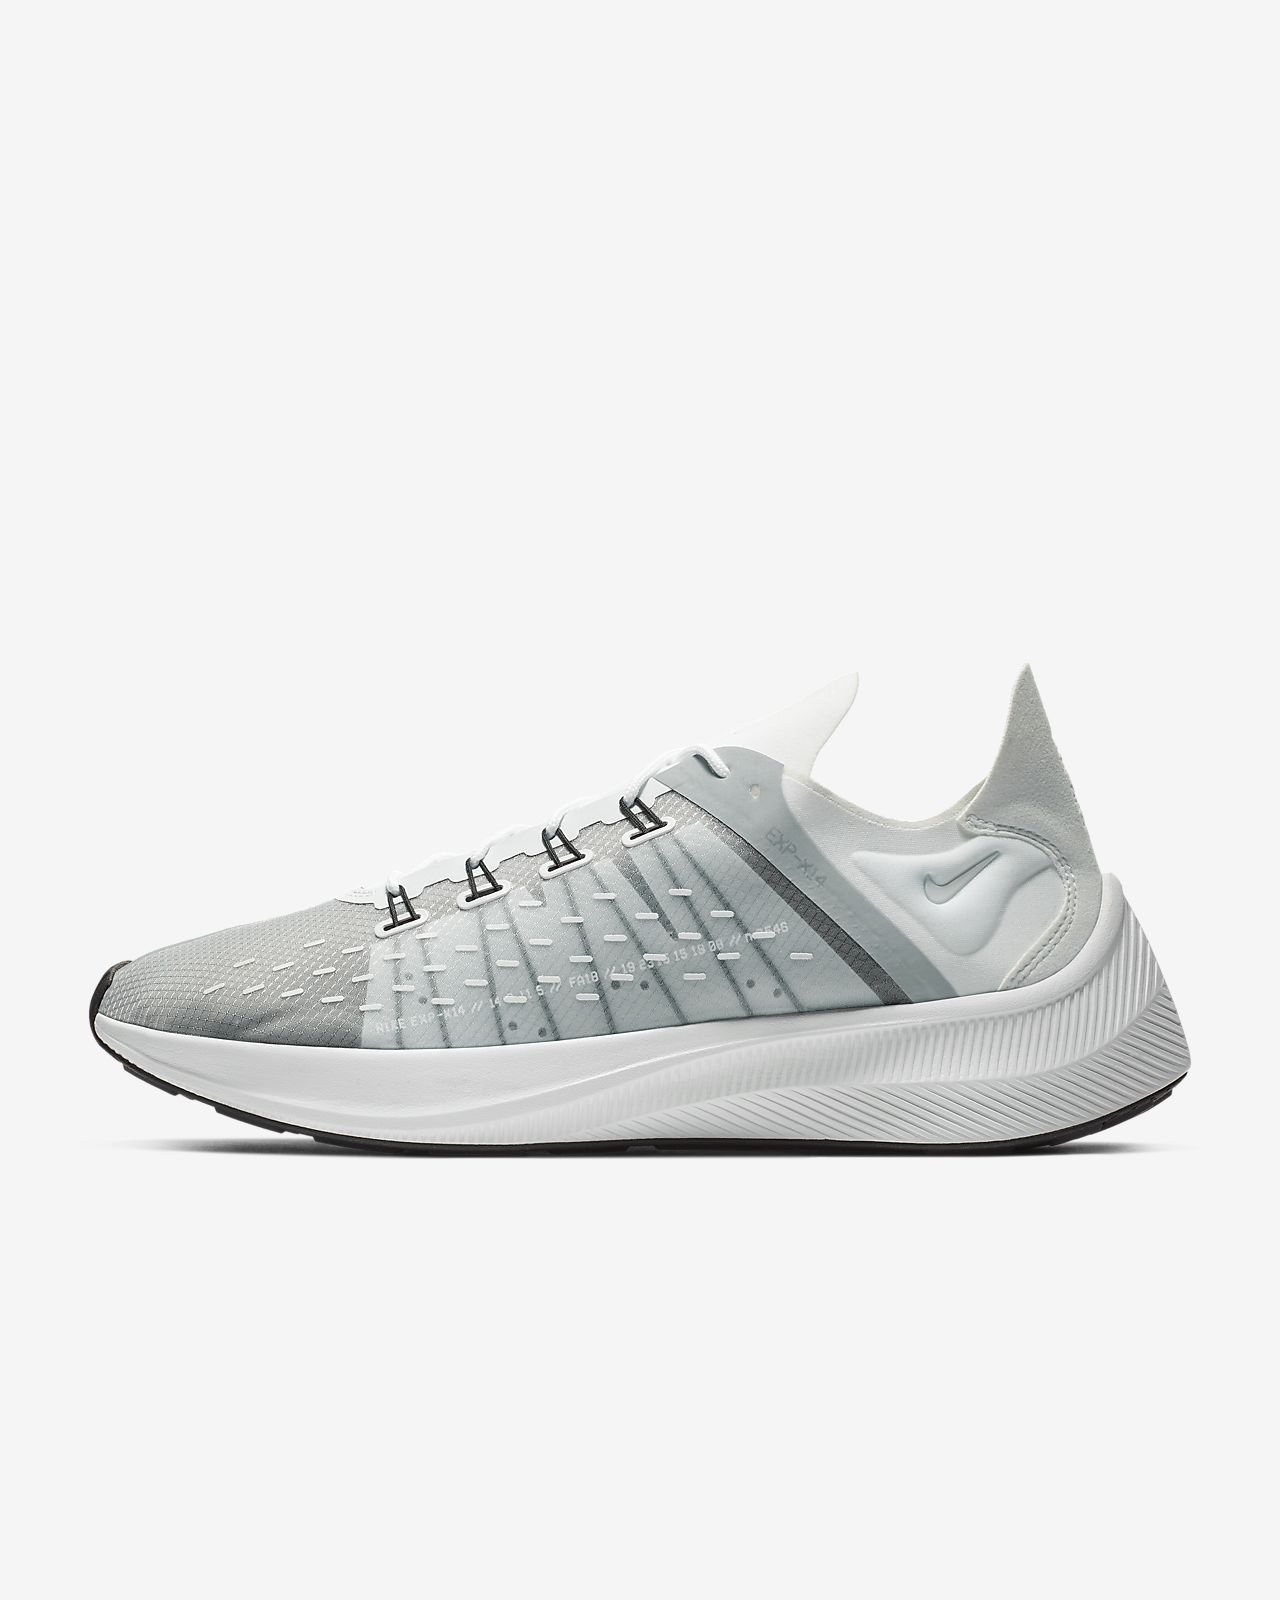 newest 05b9e c6b3a ... Chaussure Nike EXP-X14 pour Femme